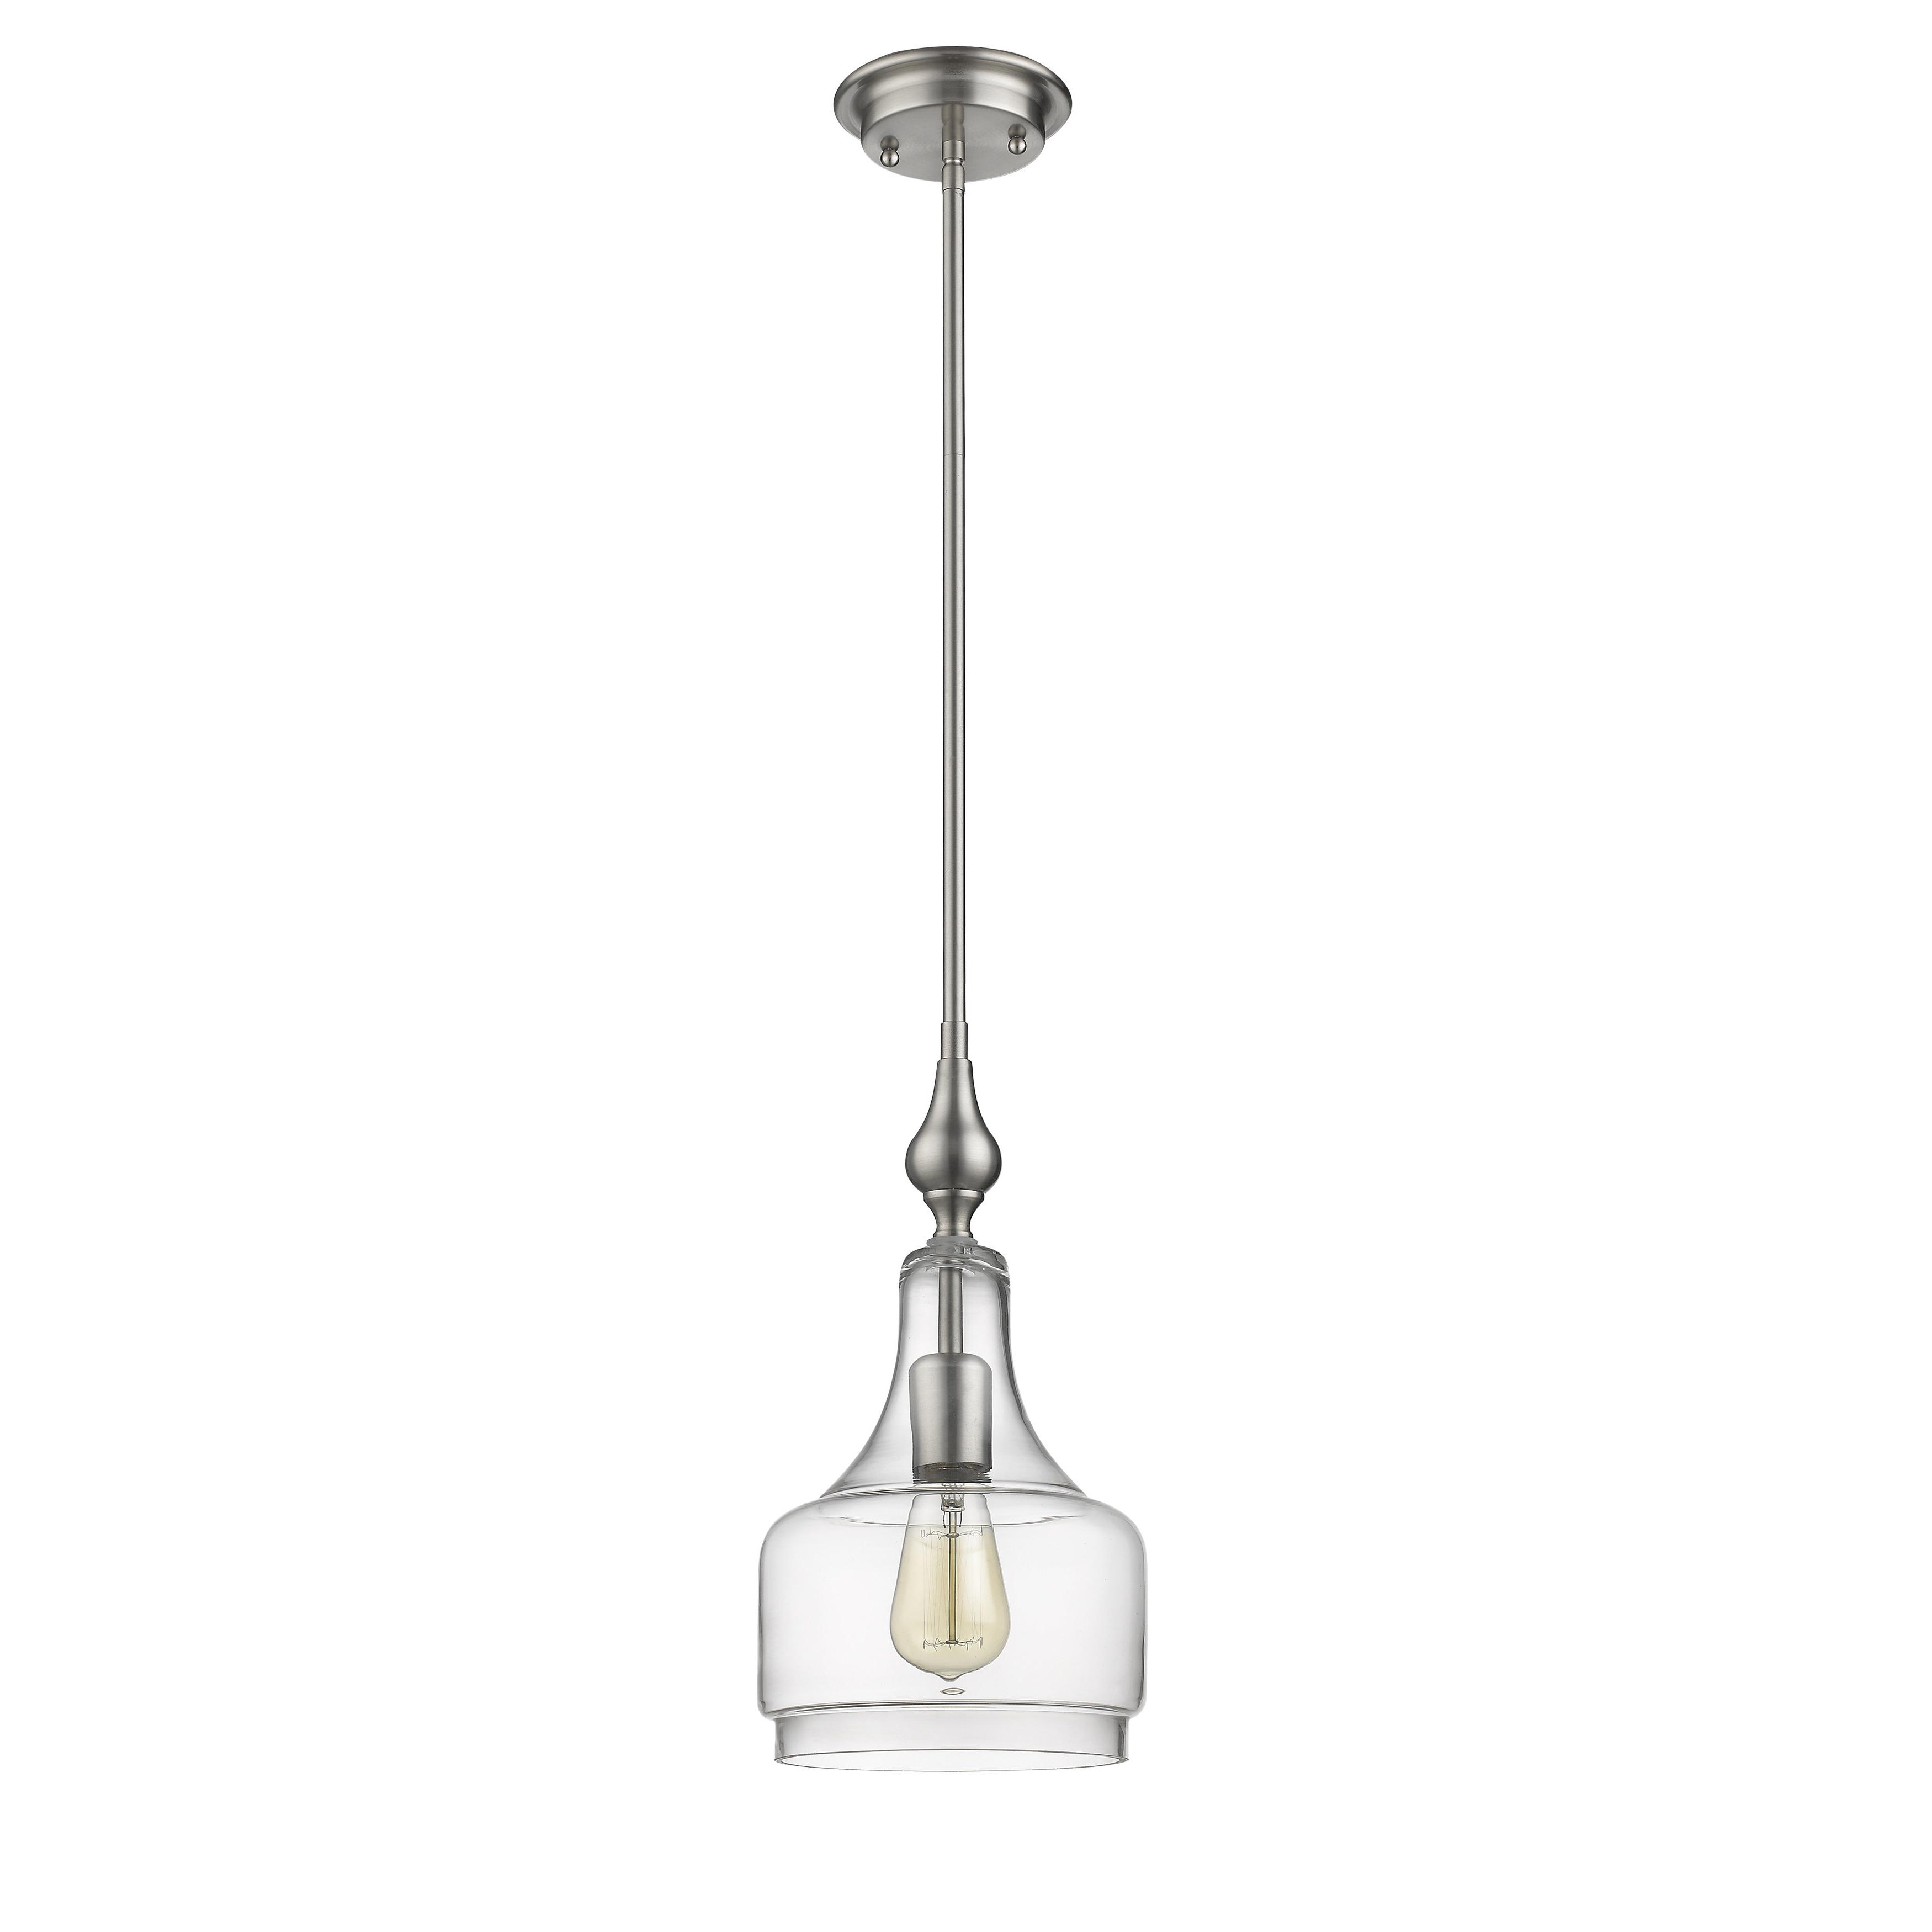 Carey 1 Light Single Bell Pendants Throughout Current Dunson 1 Light Single Bell Pendant (View 17 of 25)